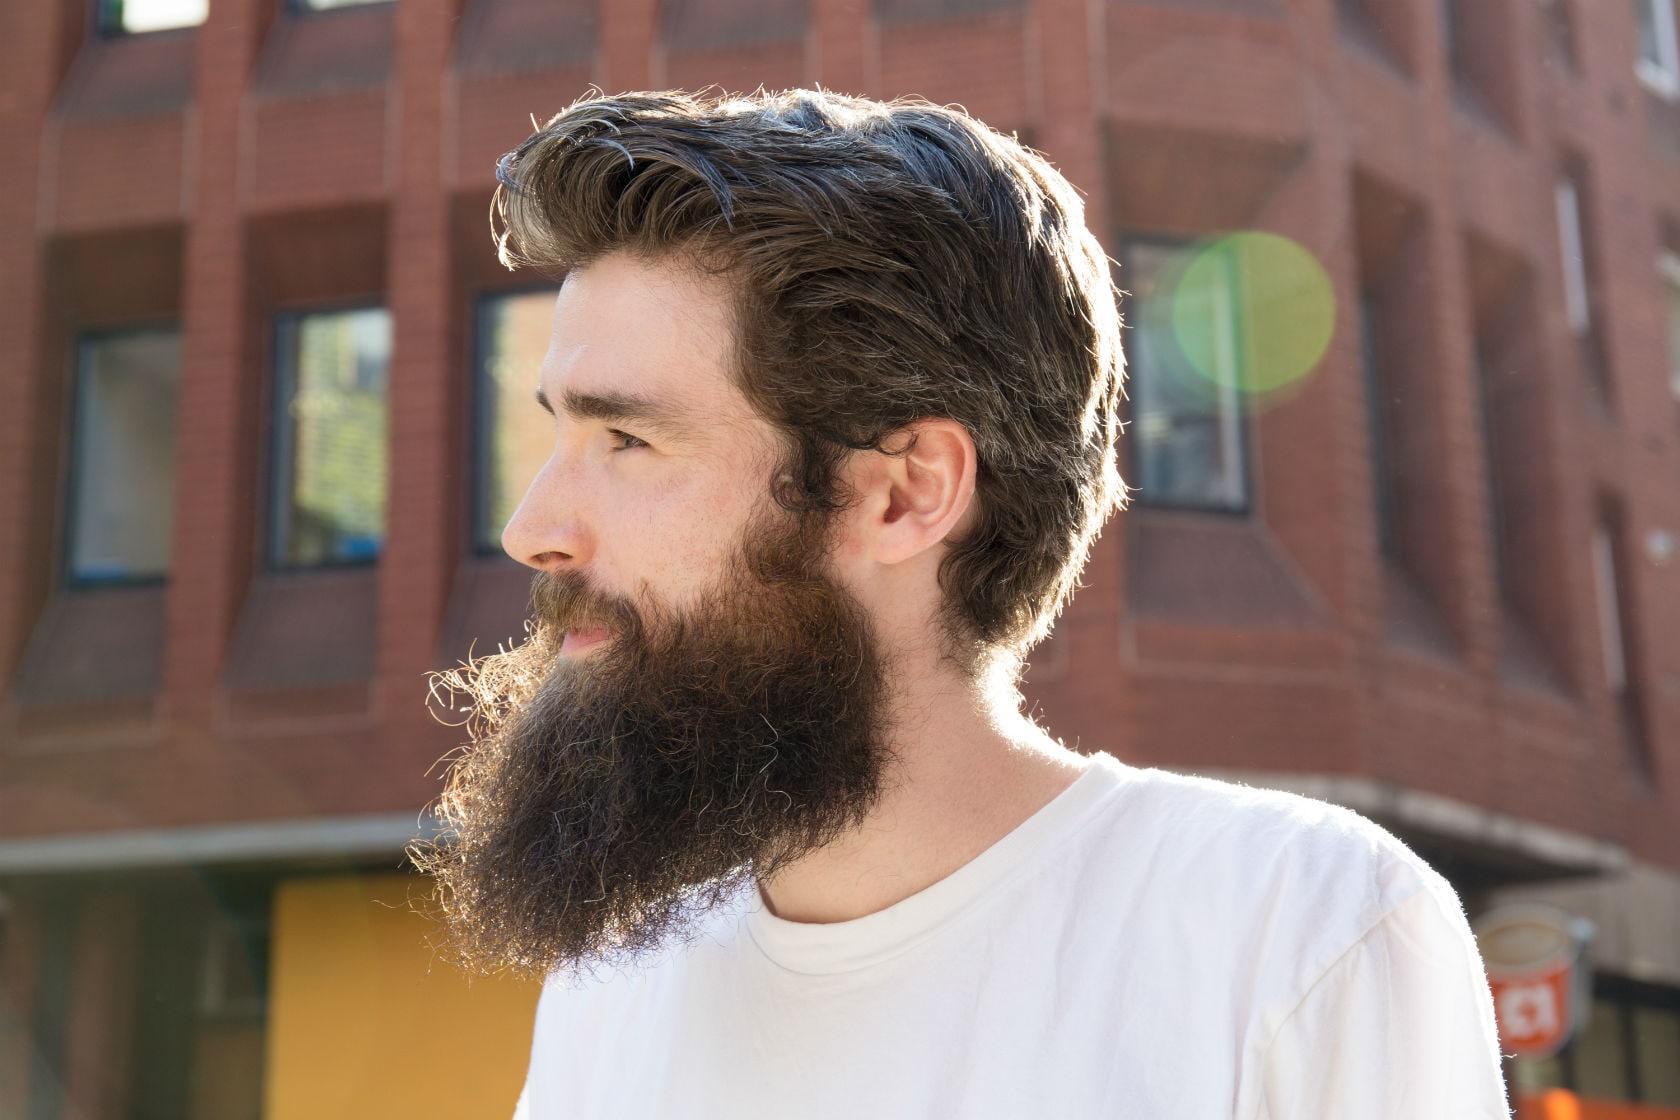 борода в турецком стиле